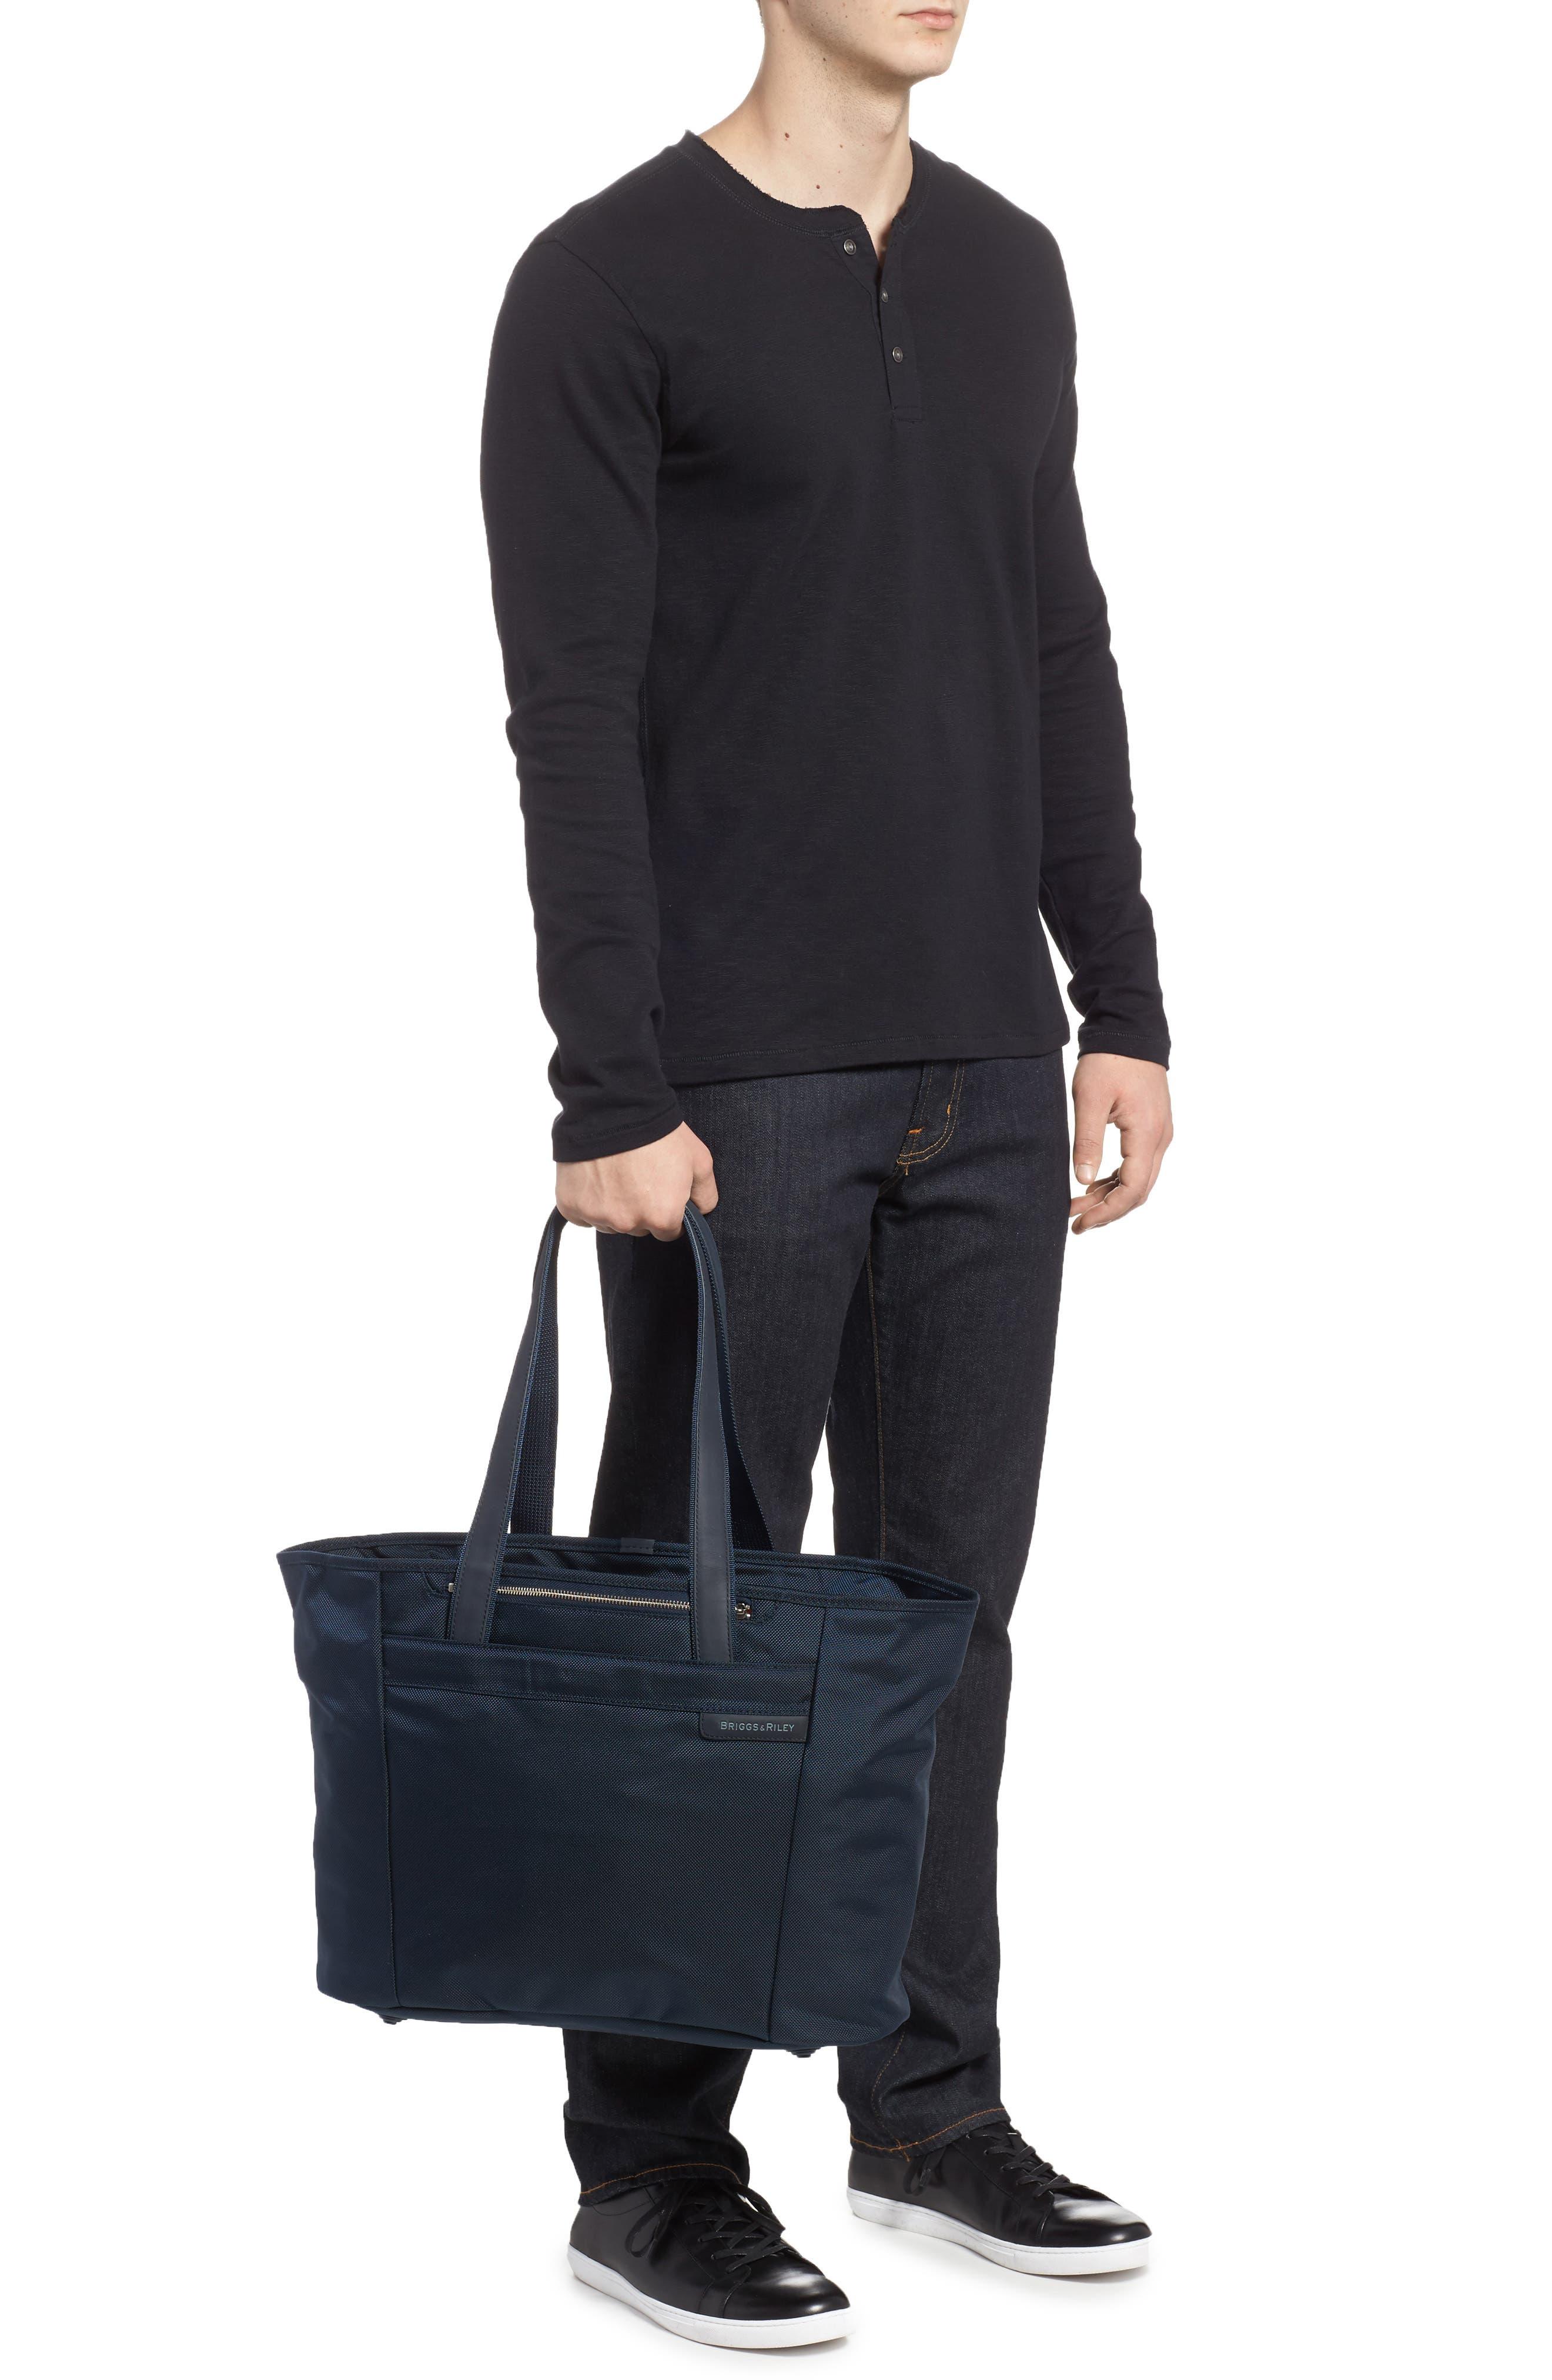 Alternate Image 2  - Briggs & Riley Ltd. Edition Tote Bag